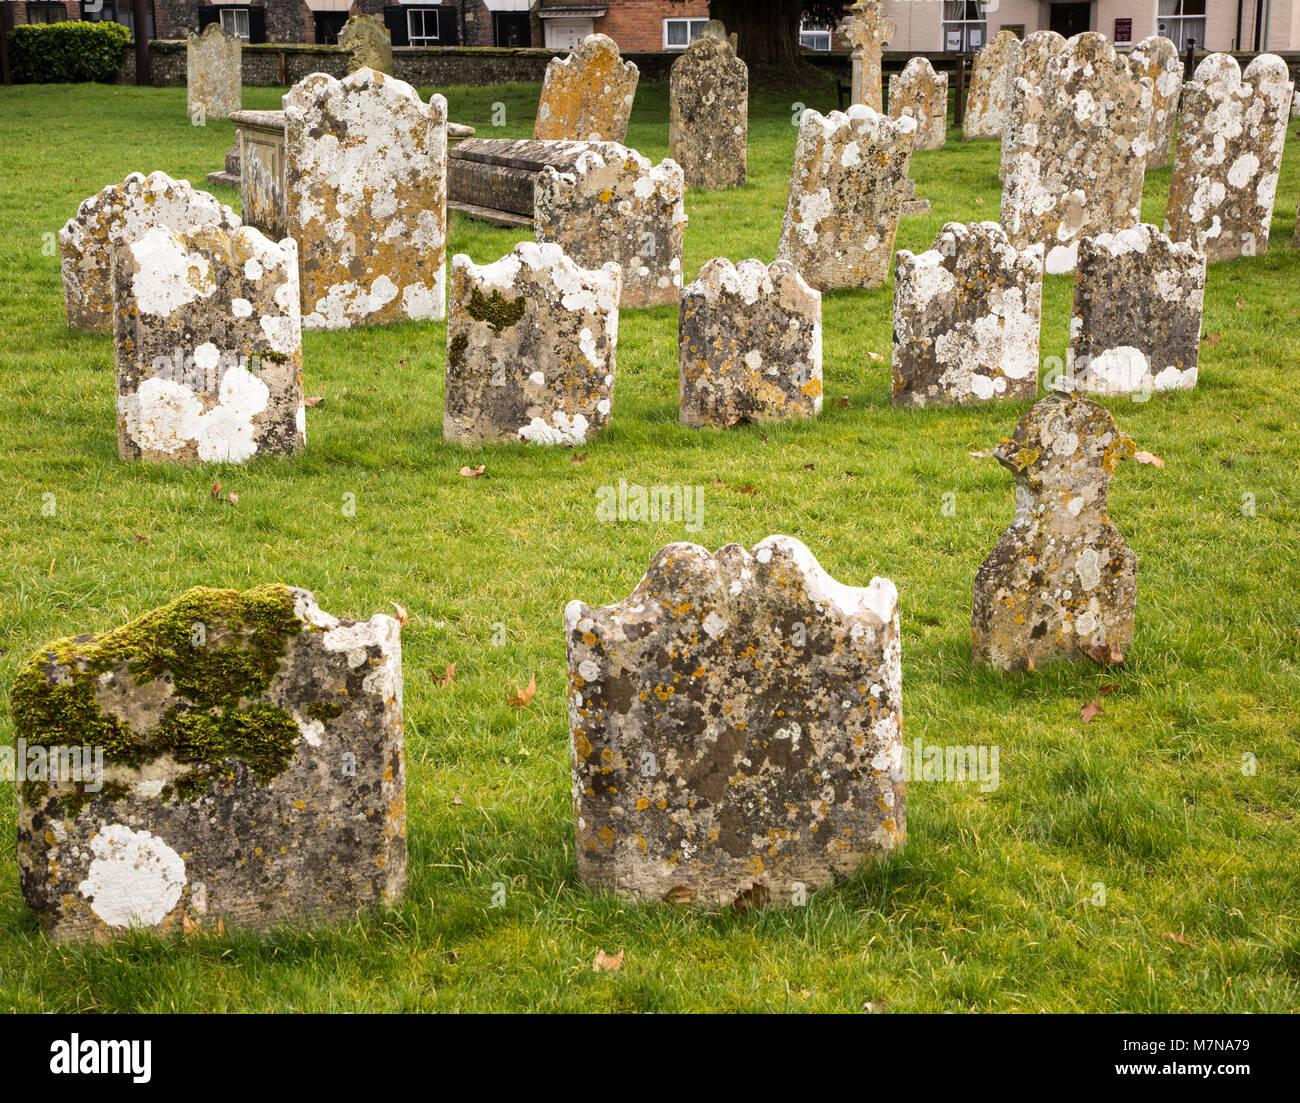 Weathered limestone gravestones, Amesbury Abbey church, Amesbury, Wiltshire, England, UK - Stock Image